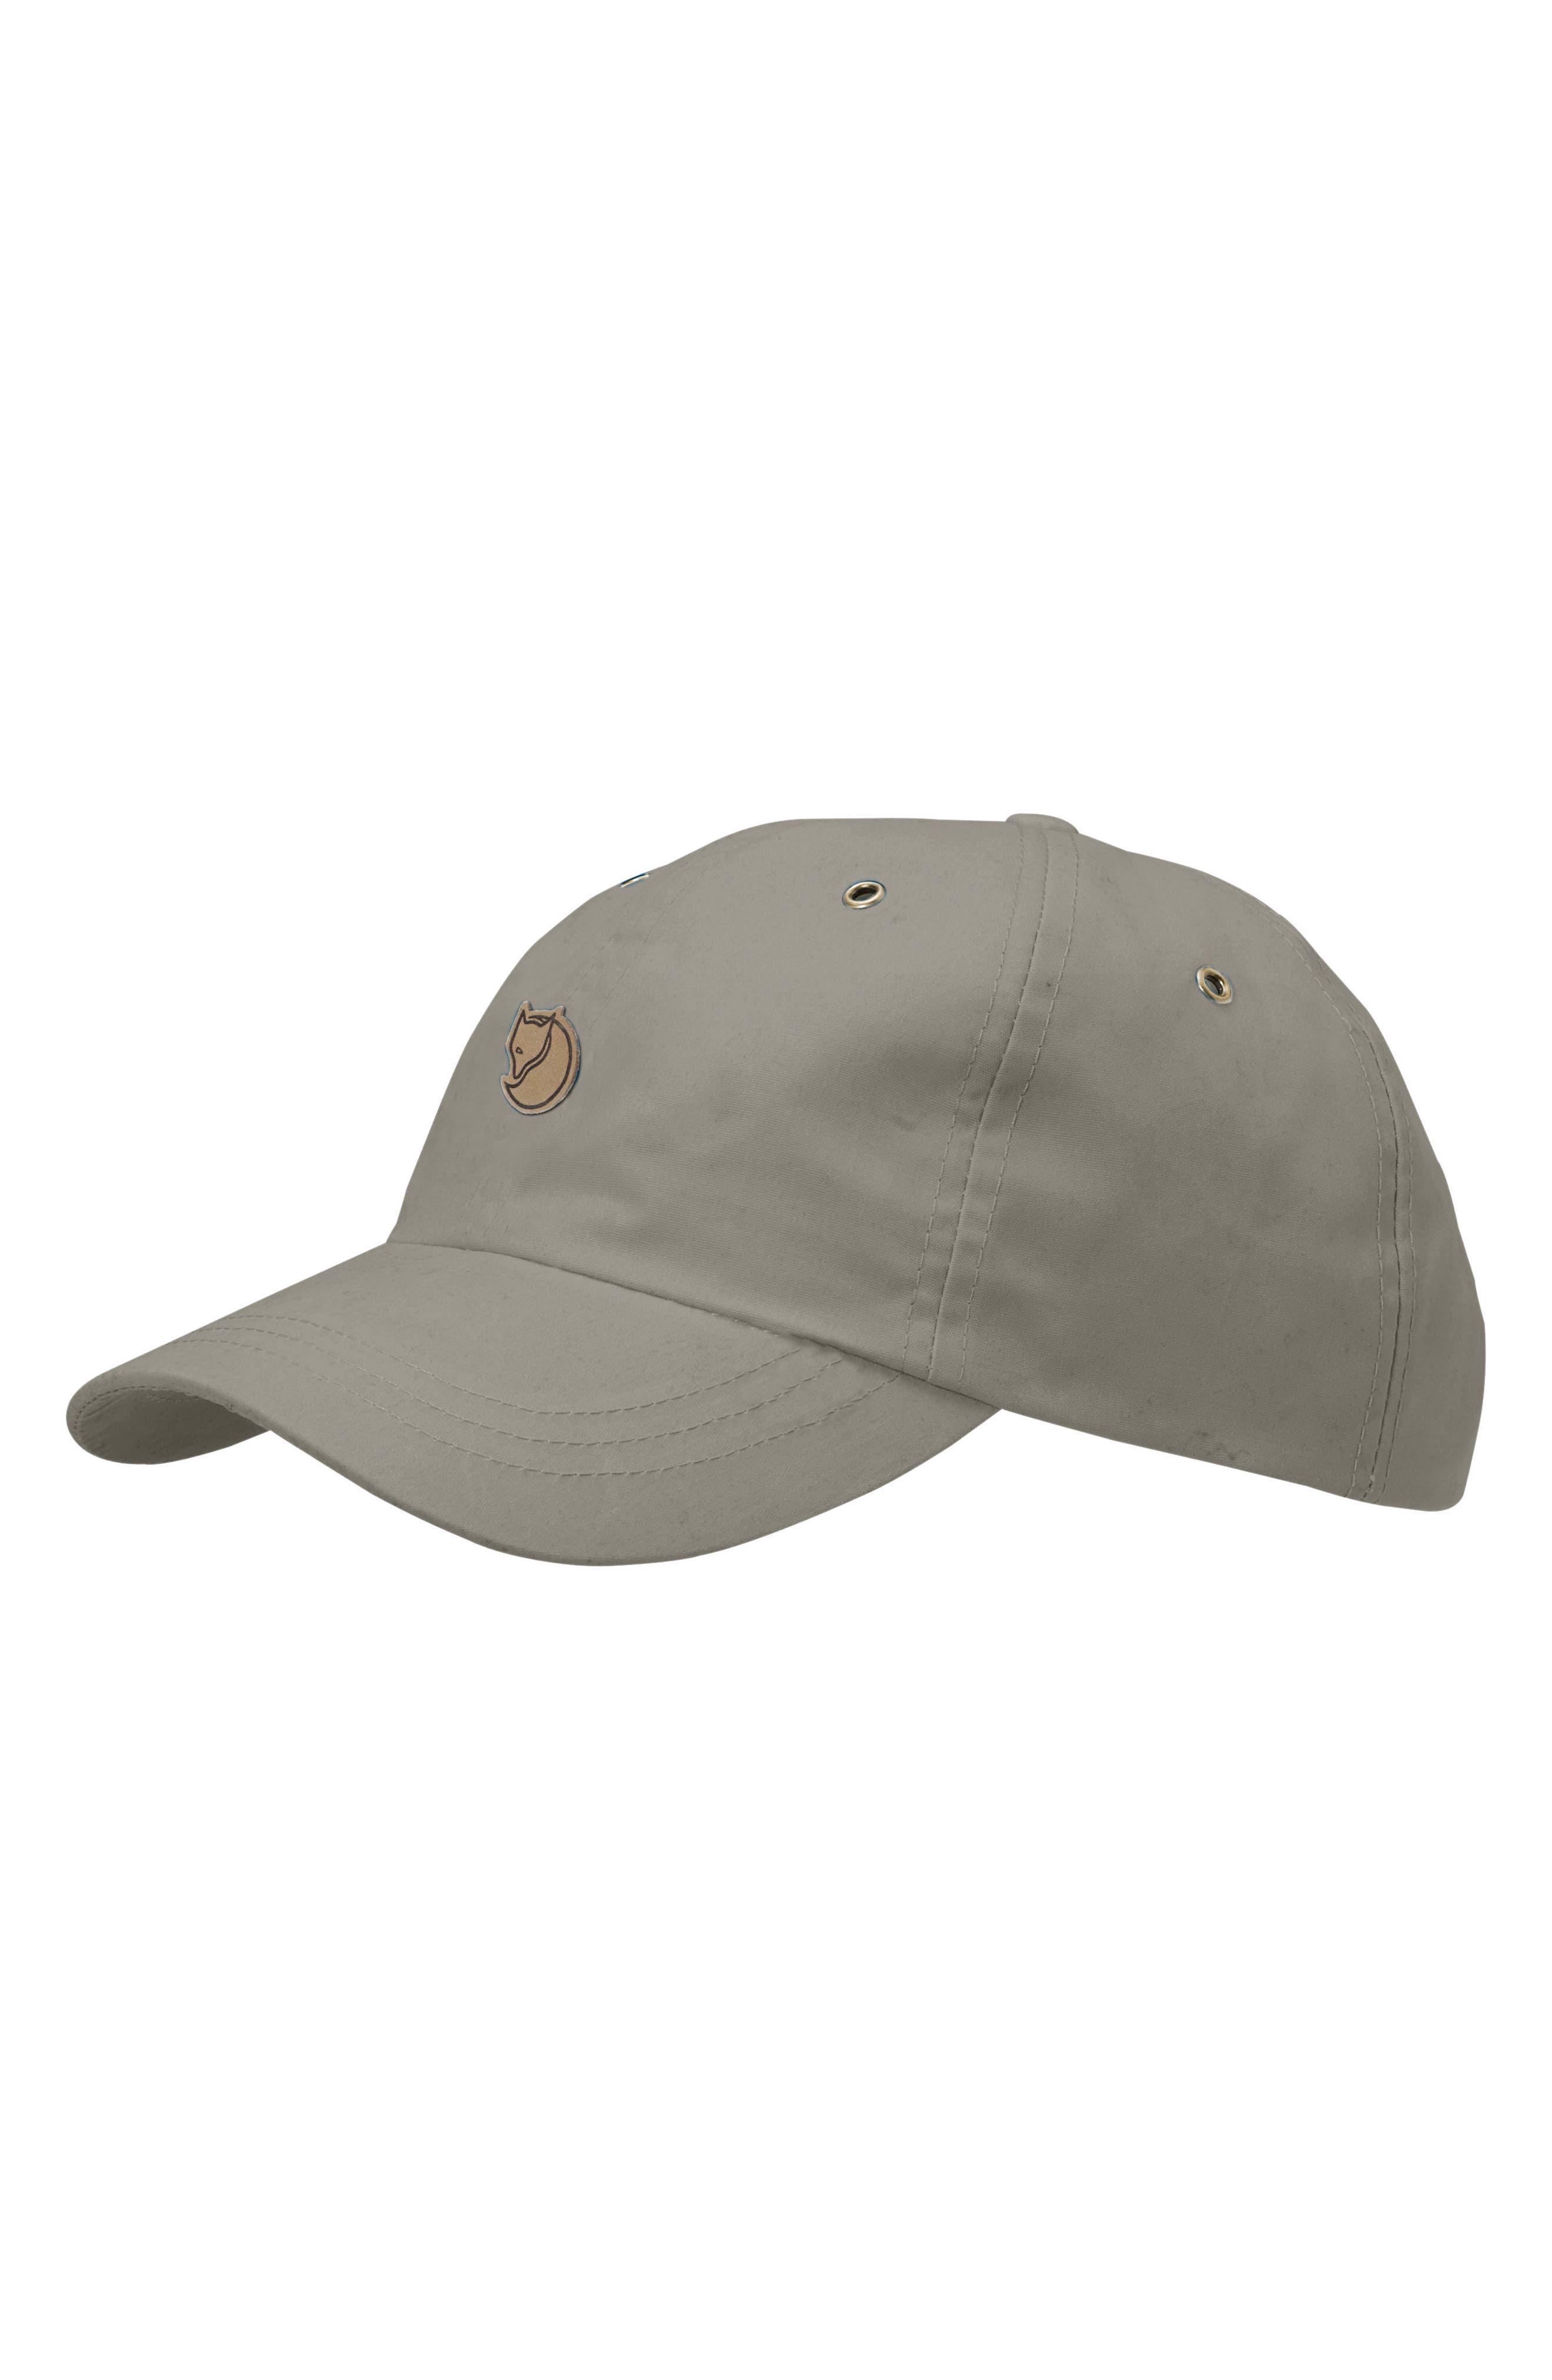 Helags Ball Cap,                         Main,                         color, Fog